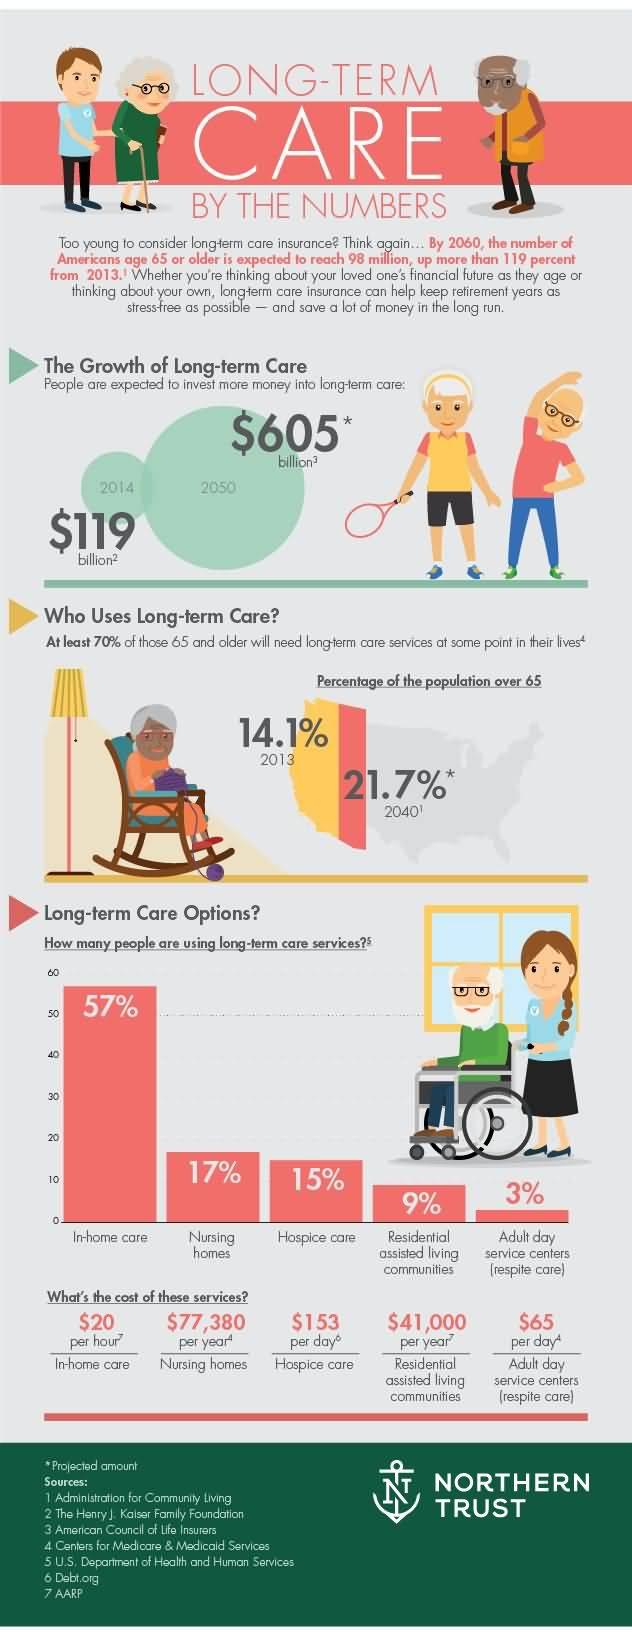 Long Term Life Insurance Quotes 20 Long Term Life Insurance Quotes And Photos  Quotesbae